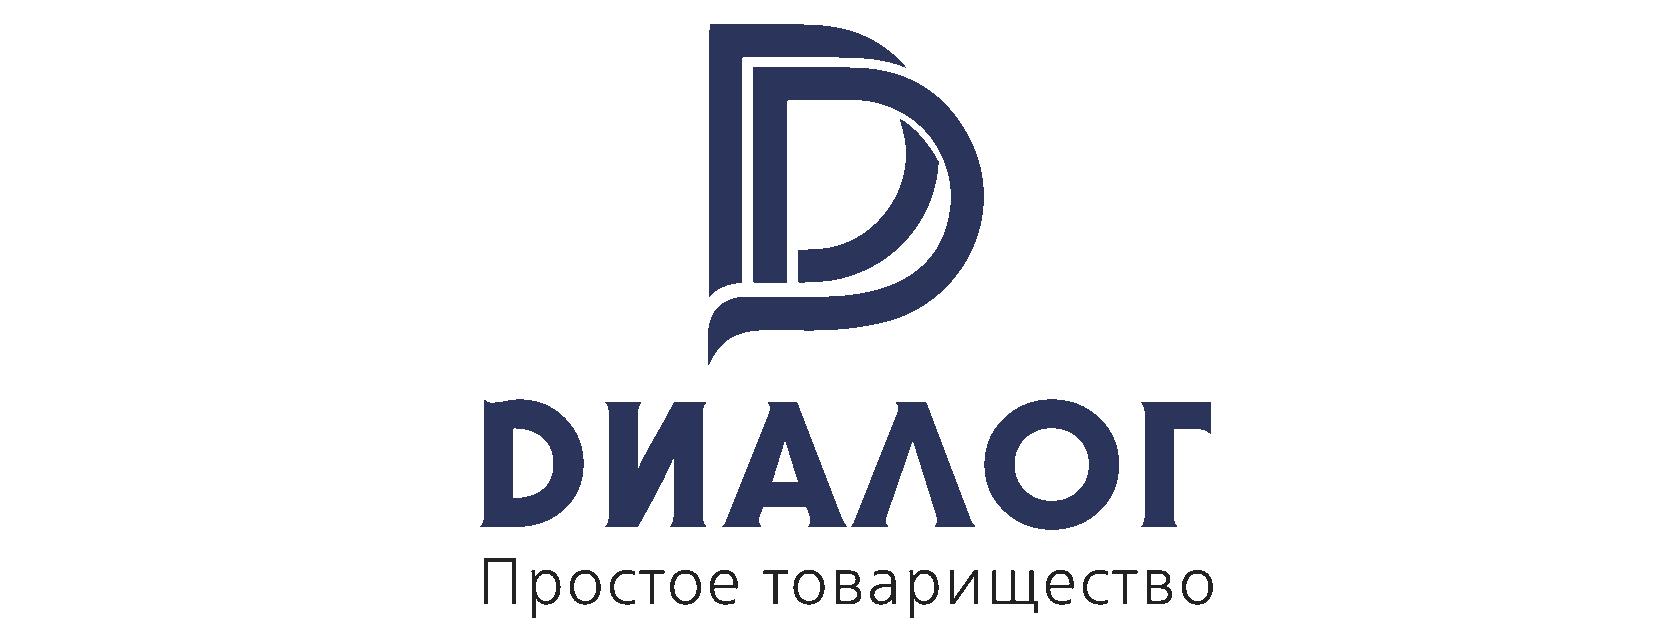 General Partnership Dialog